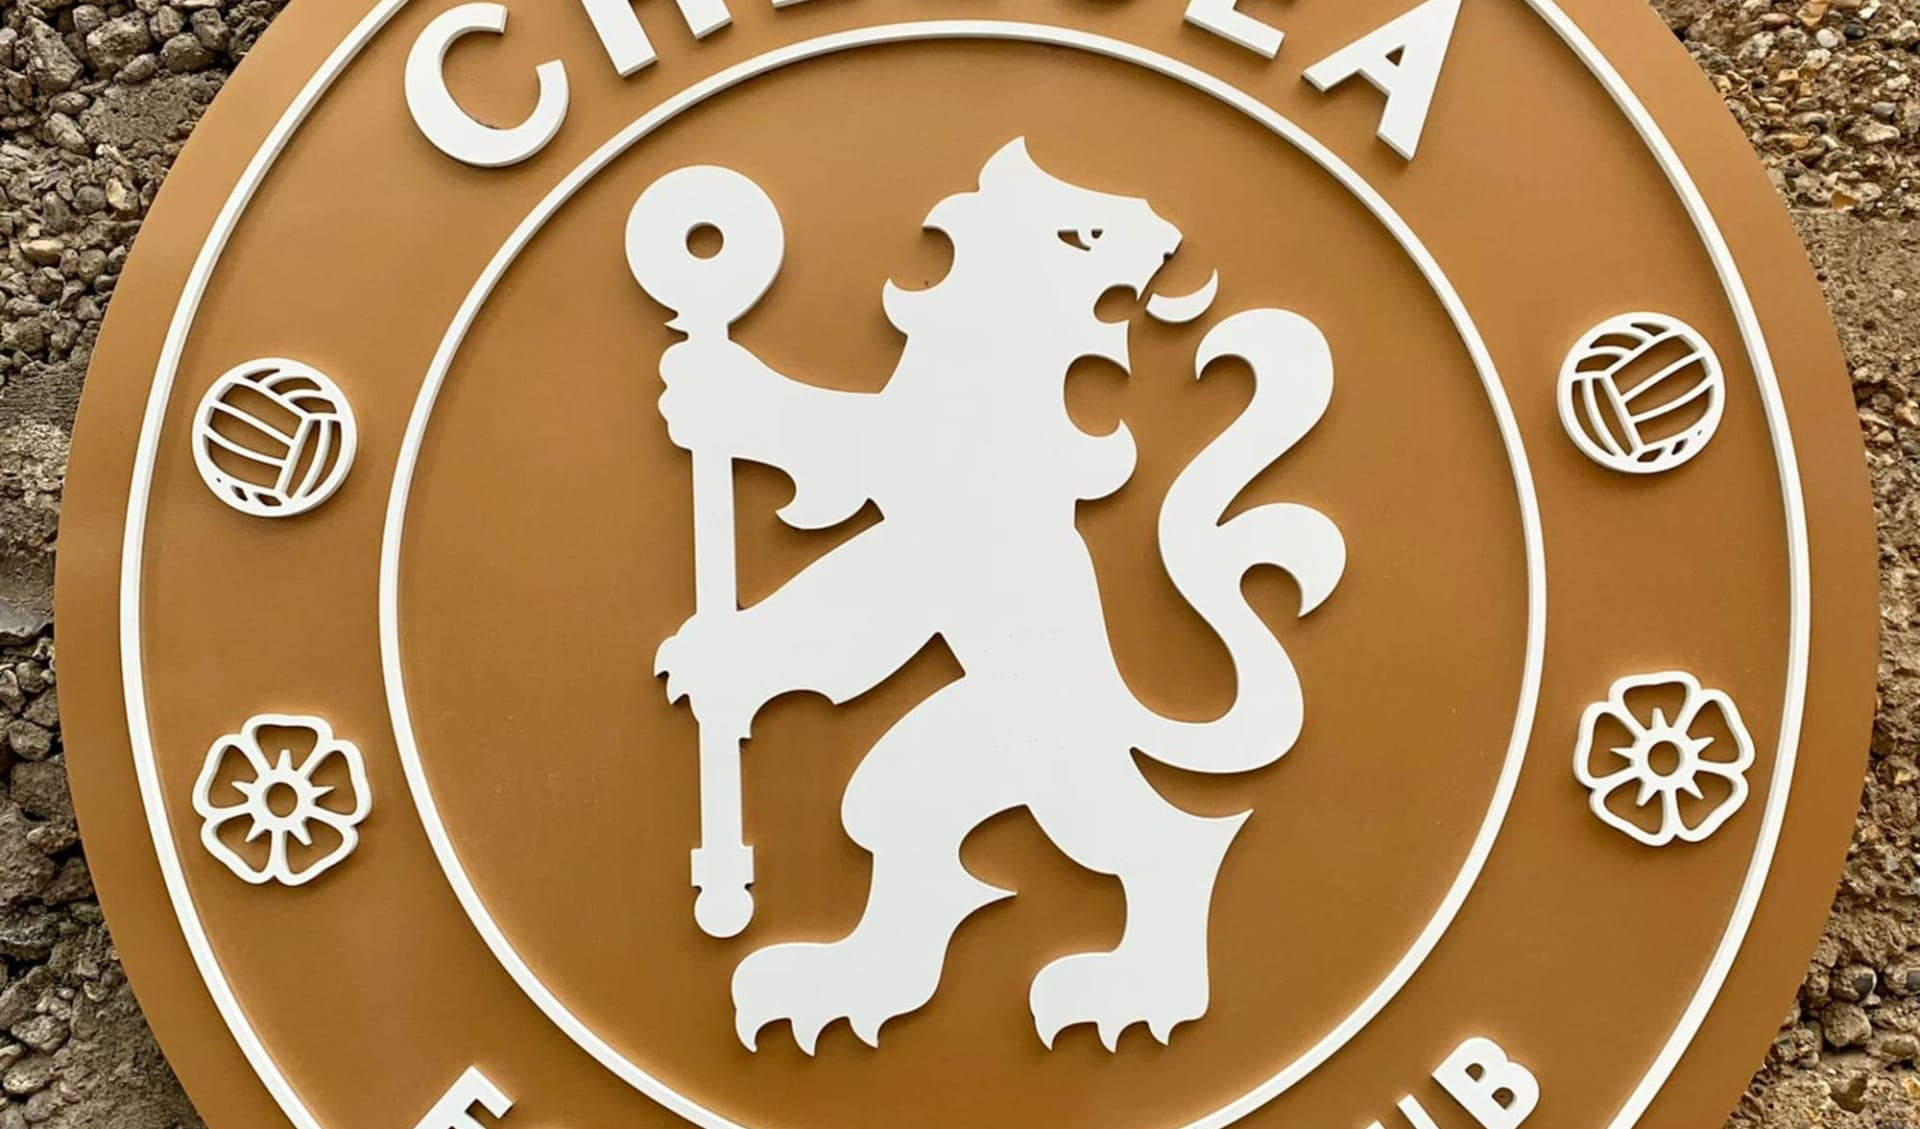 FC Chelsea ab London: Chelsea Seat Location Image